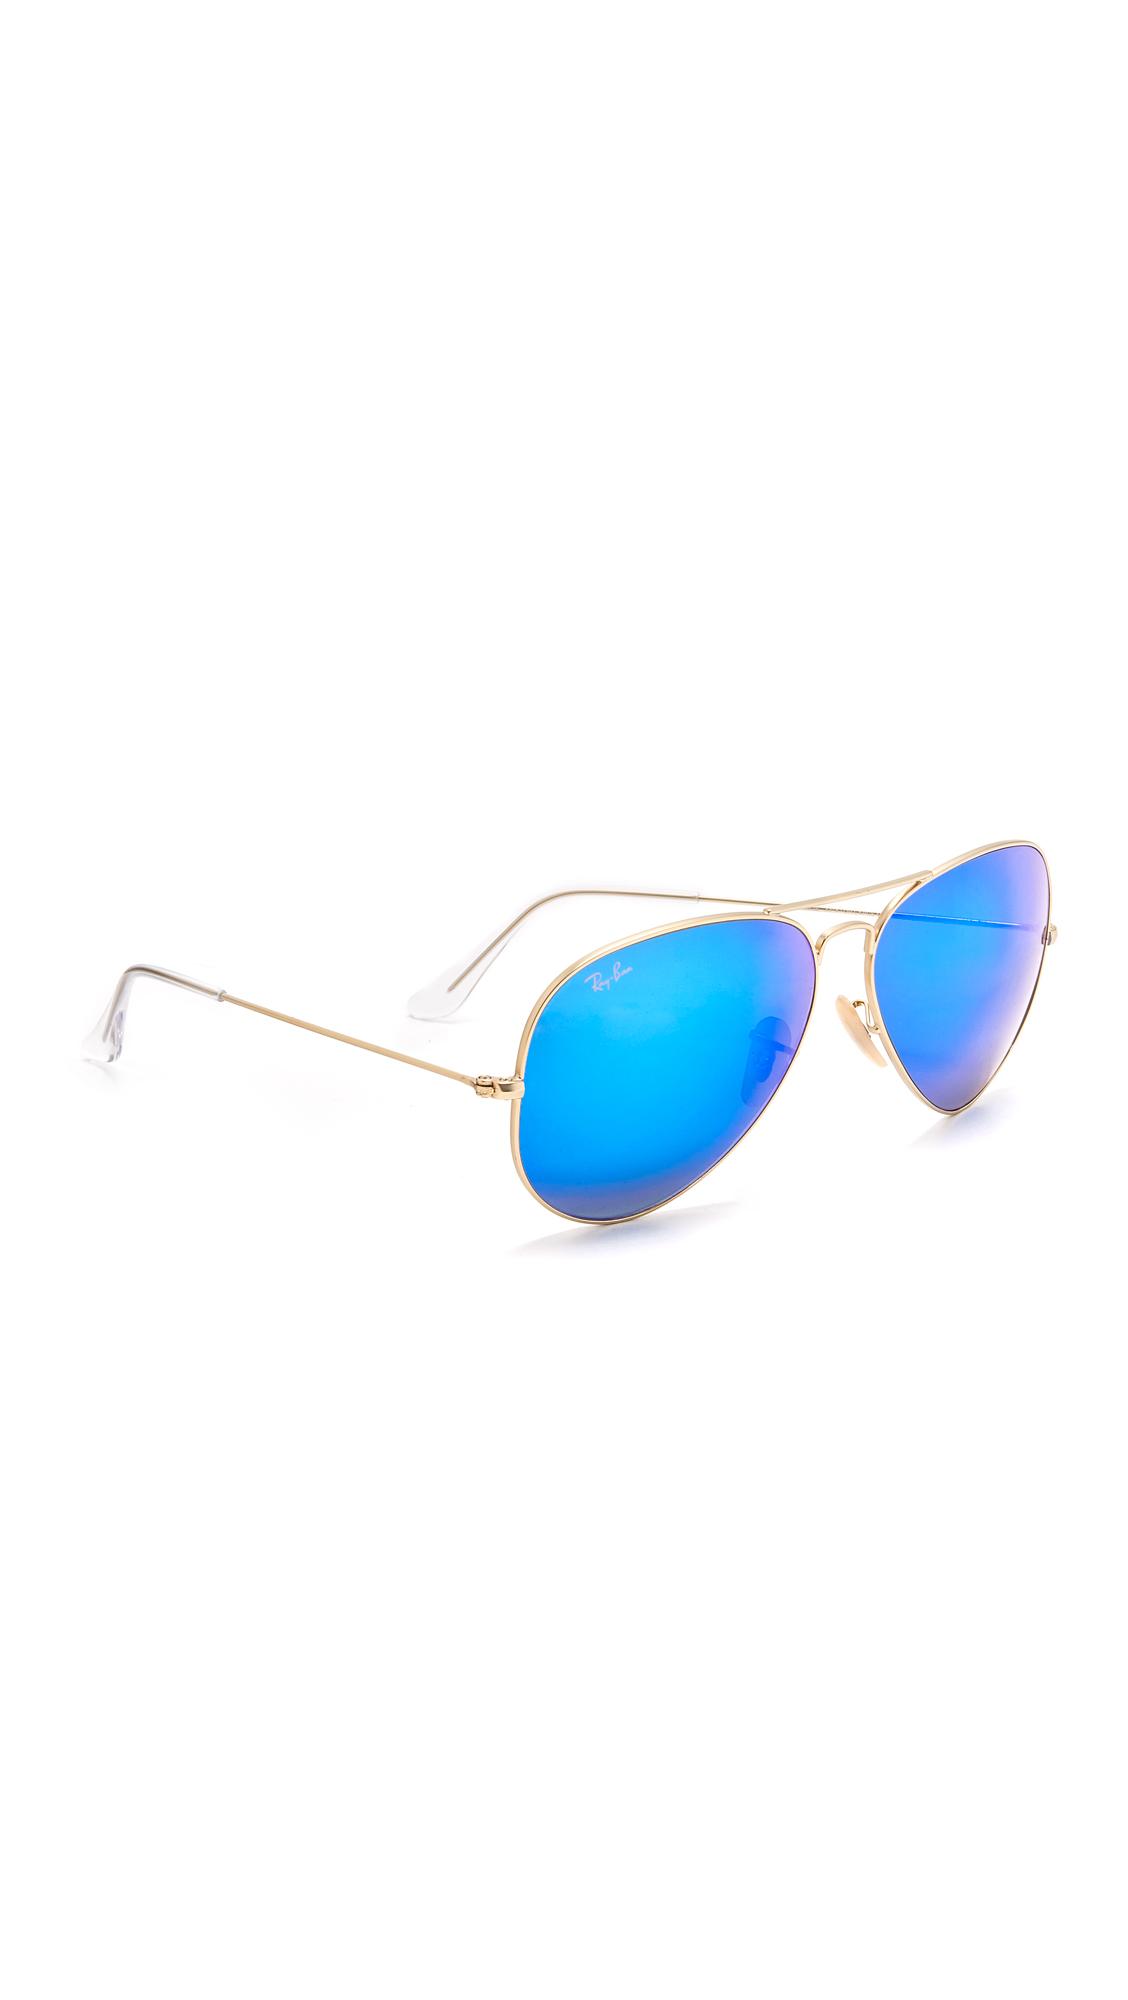 Ray-Ban Oversized Mirrored Aviator Sunglasses - Gold/Blue